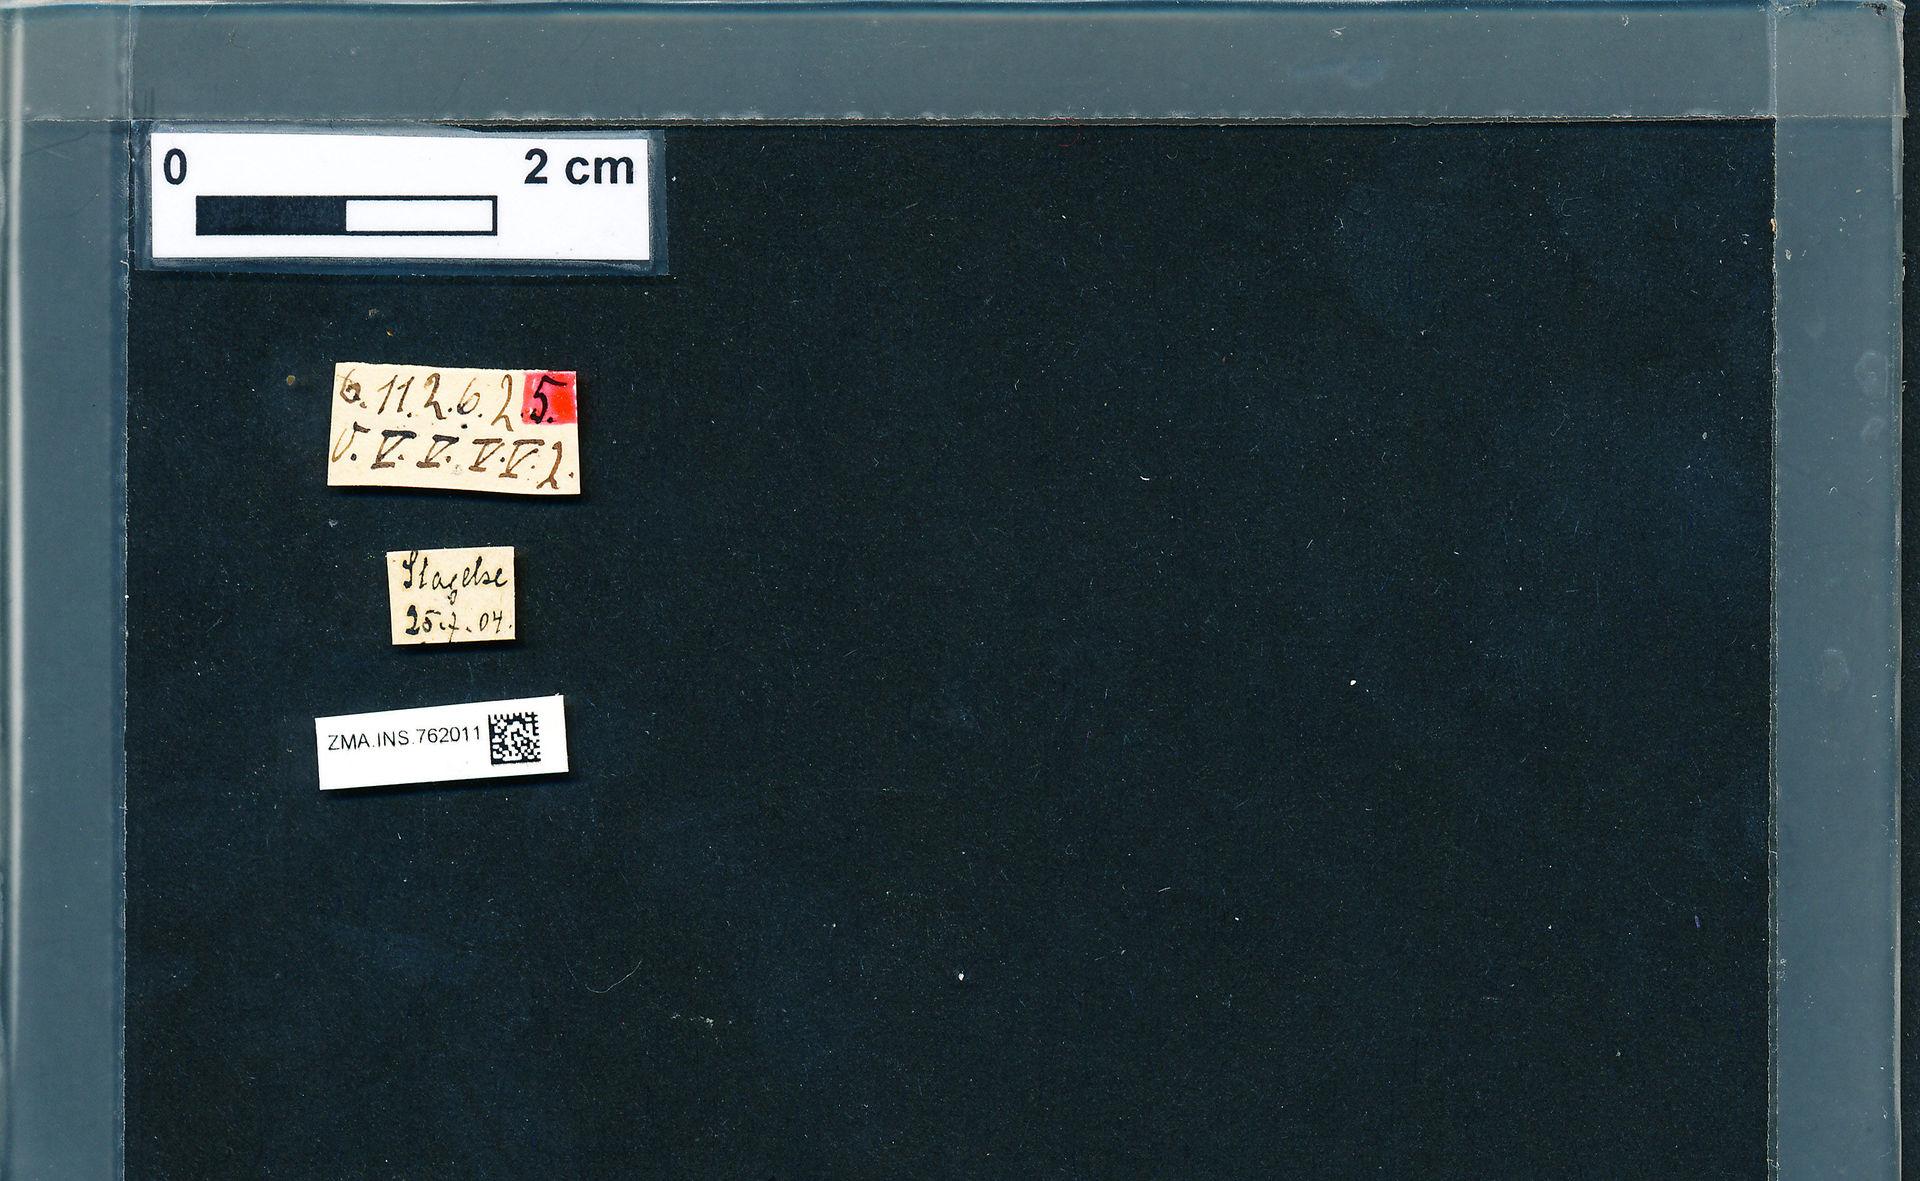 ZMA.INS.762011 | Bombus (Pyrobombus) pratorum pratorum Linnaeus, 1761